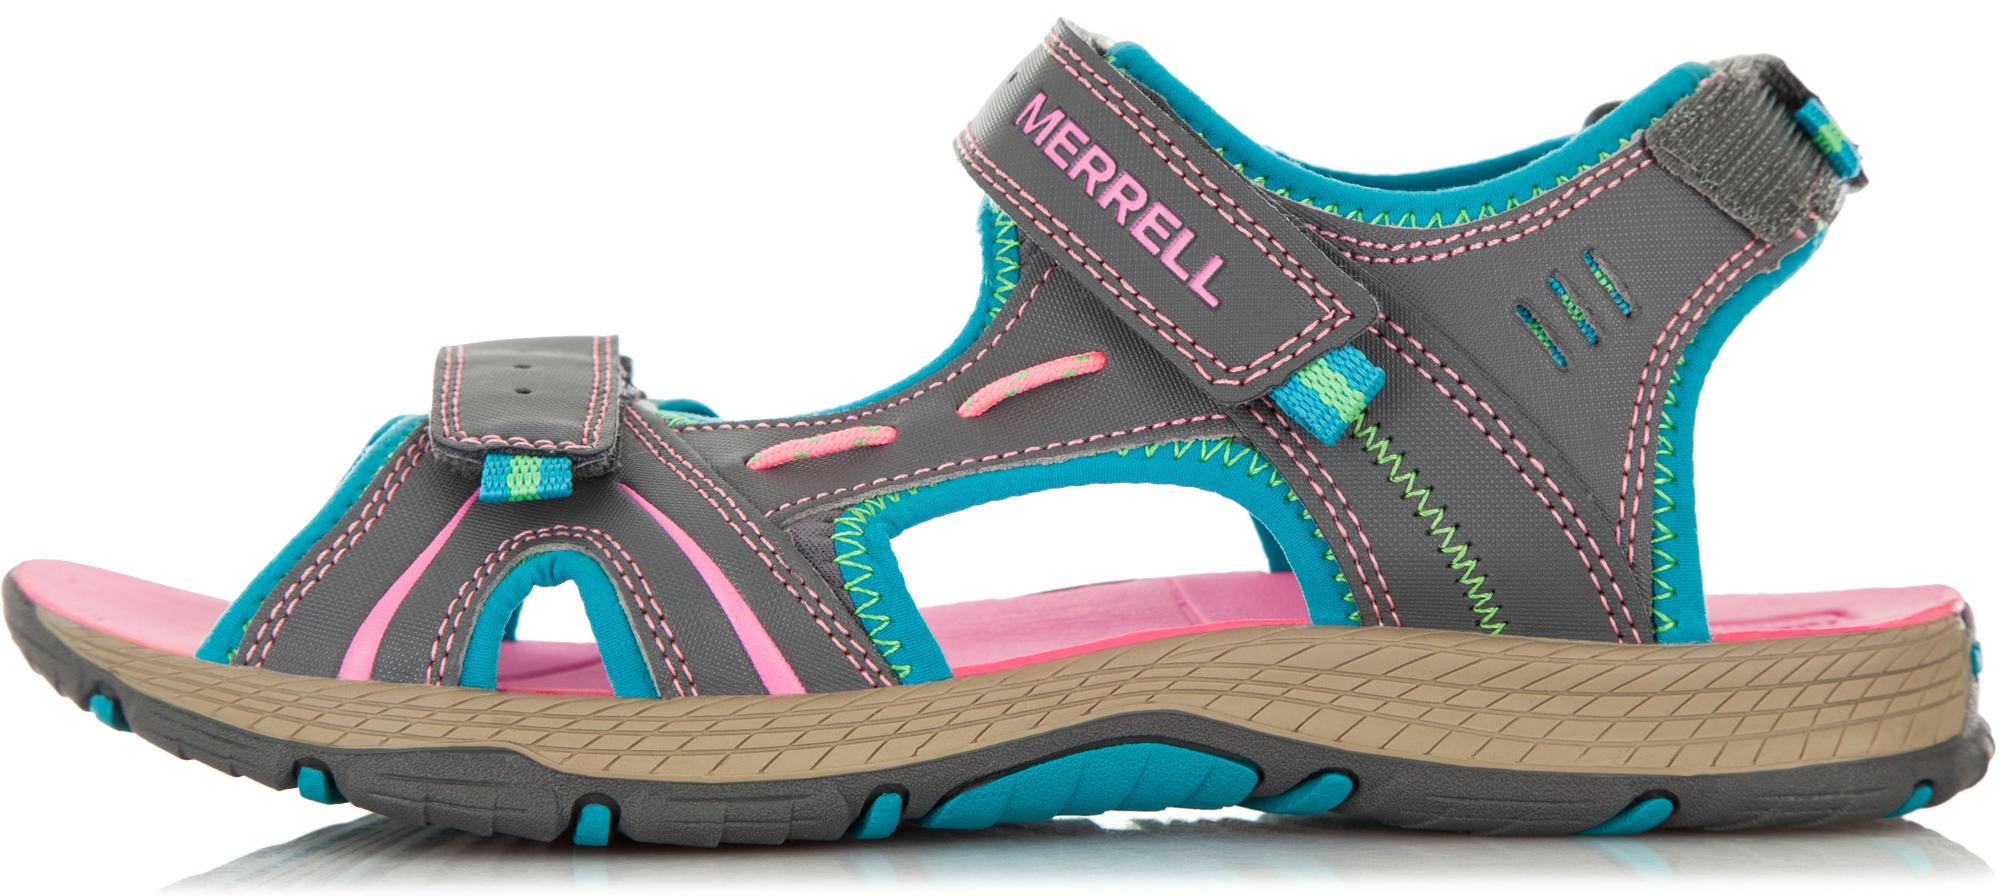 цена Merrell Сандали для девочек Merrell Panther, размер 34,5 онлайн в 2017 году